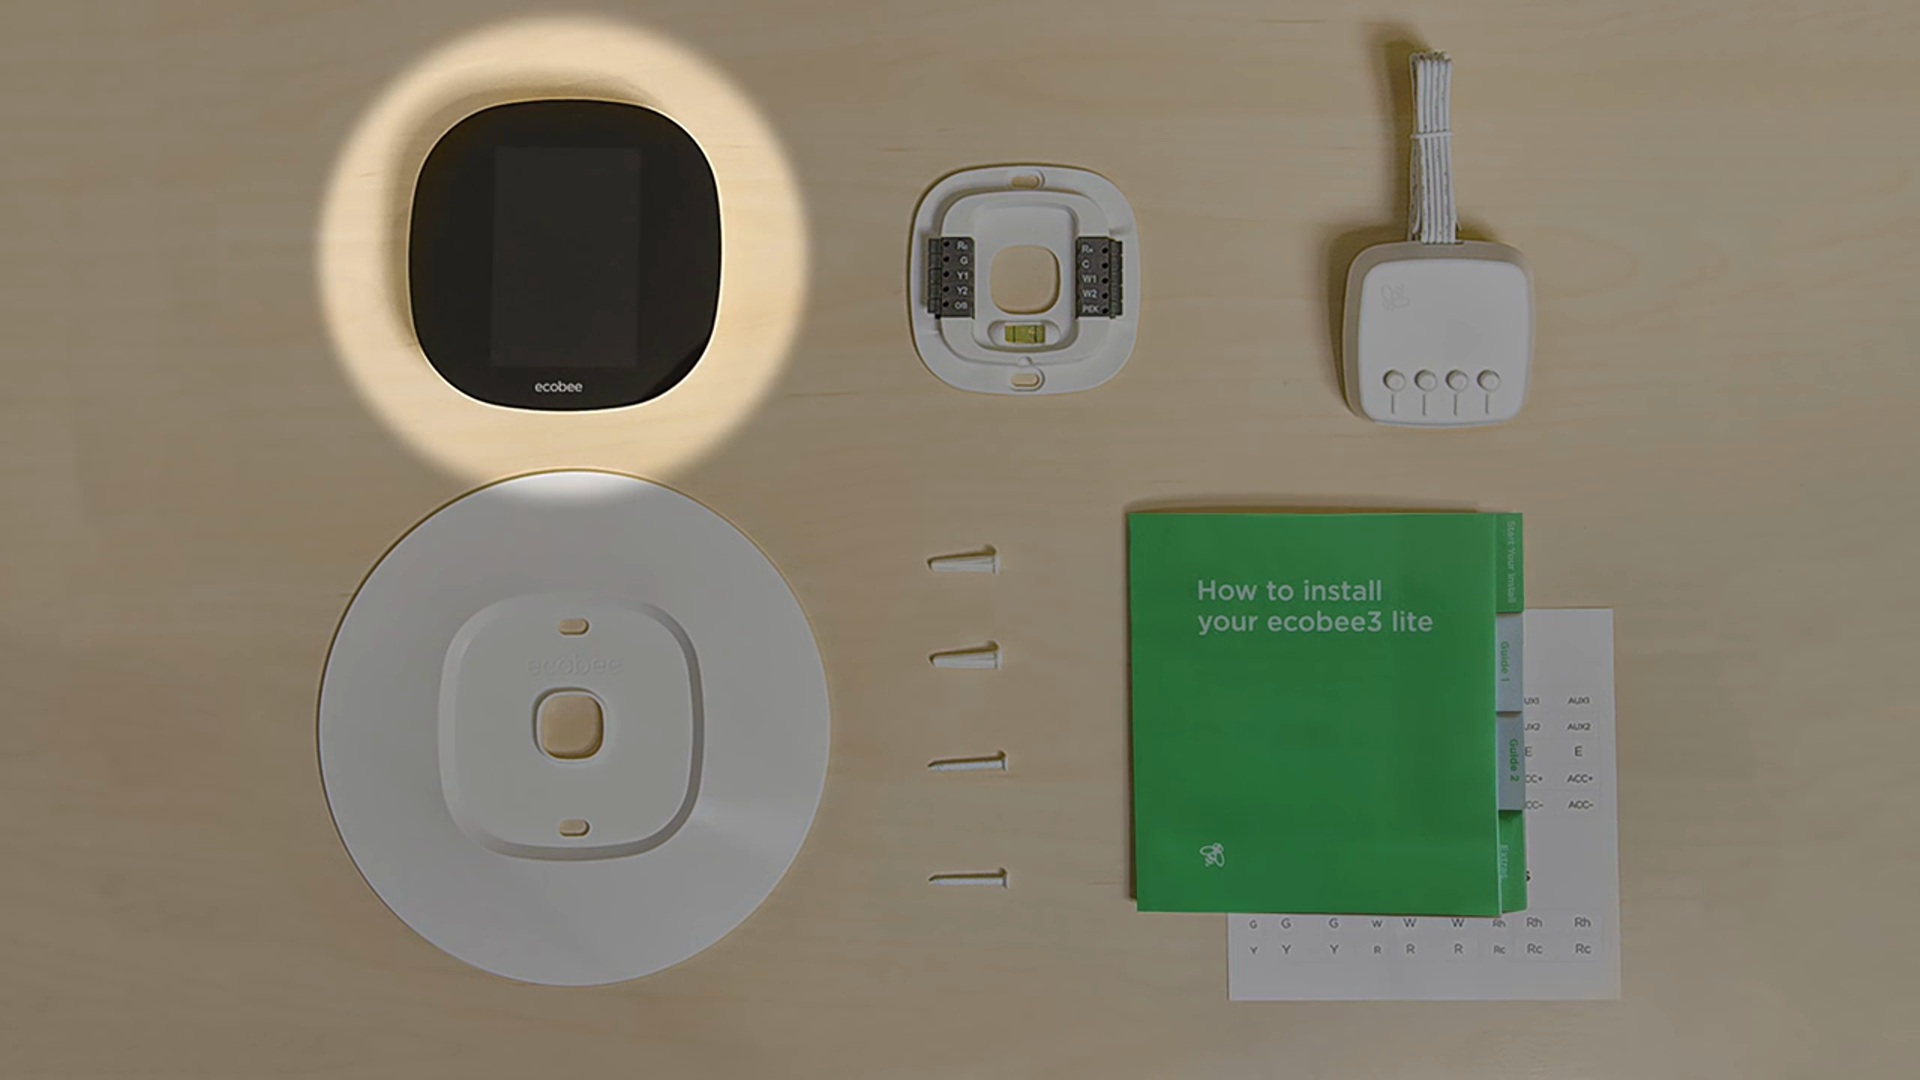 Installing Ecobee3 Lite Smart Thermostat